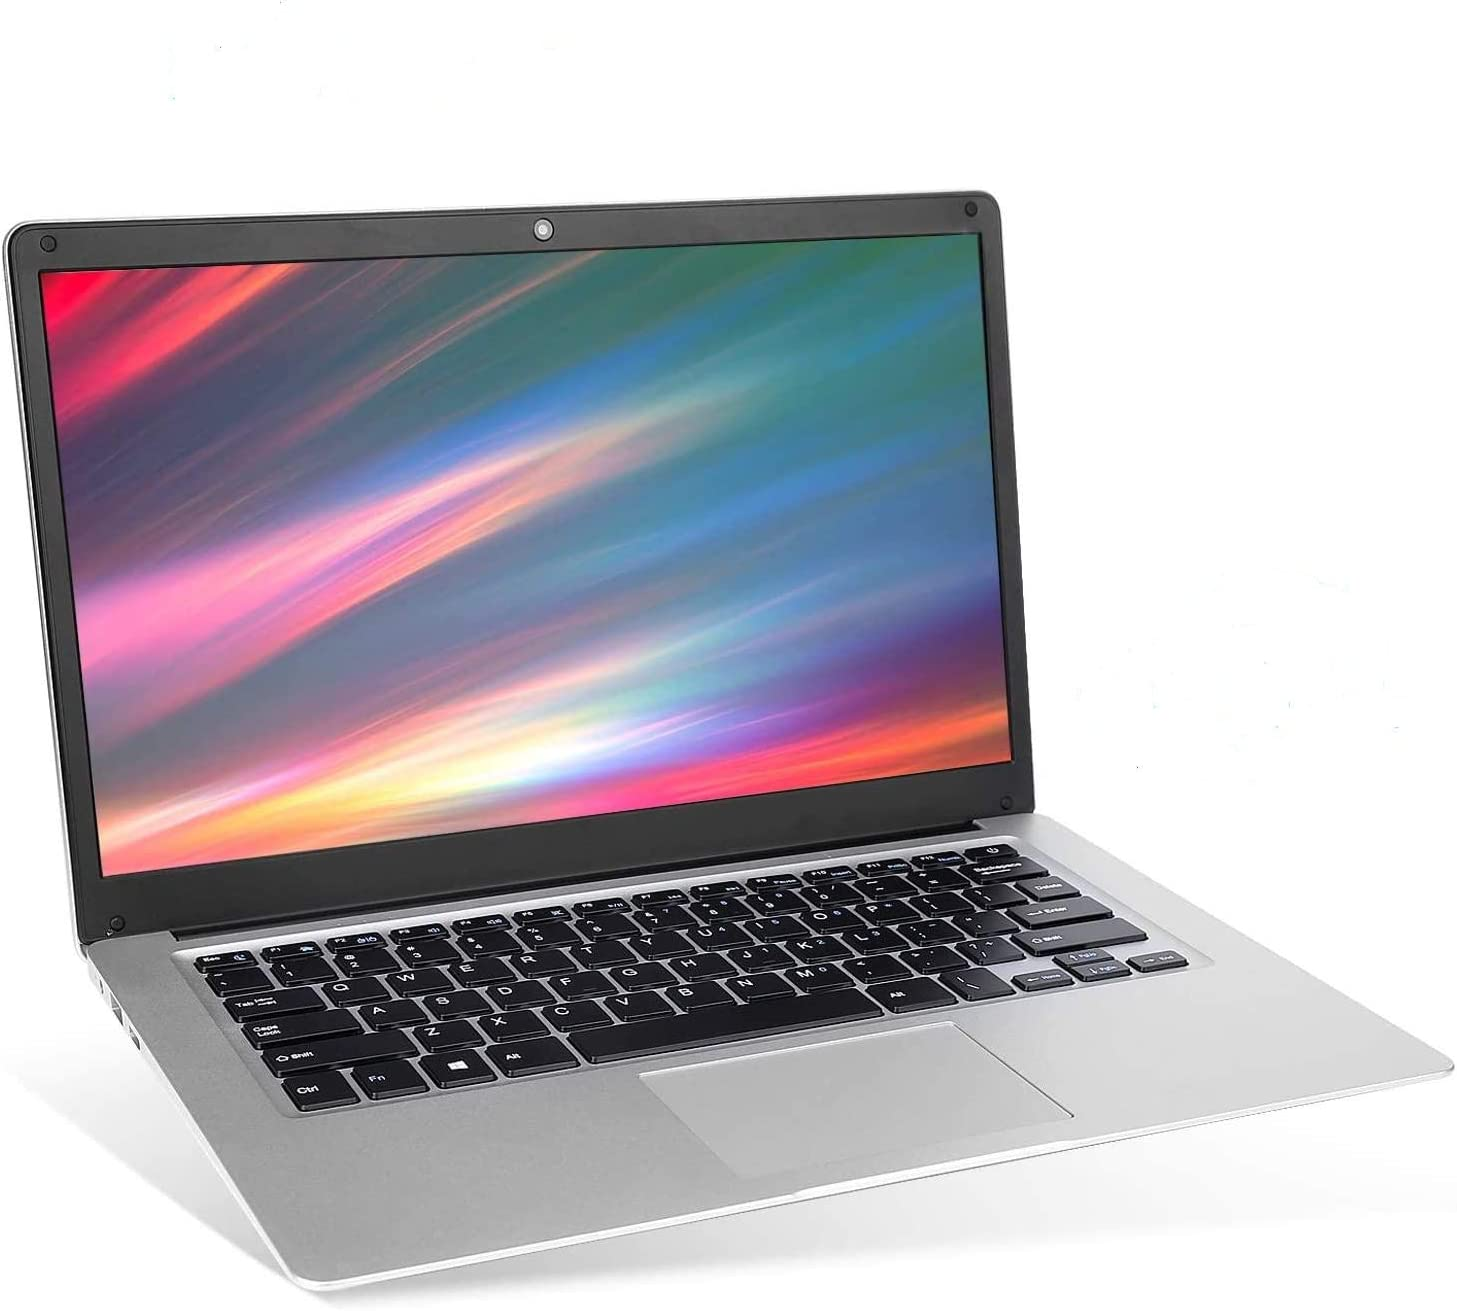 13.3 Inch Laptop (Intel Celeron_j3455 Quad Core CPU ,6GB DDR3 RAM ,128GB SSD ,10000mAH Battery , 5G WiFi ,HD Webcam ,Windows 10 Preinstalled )